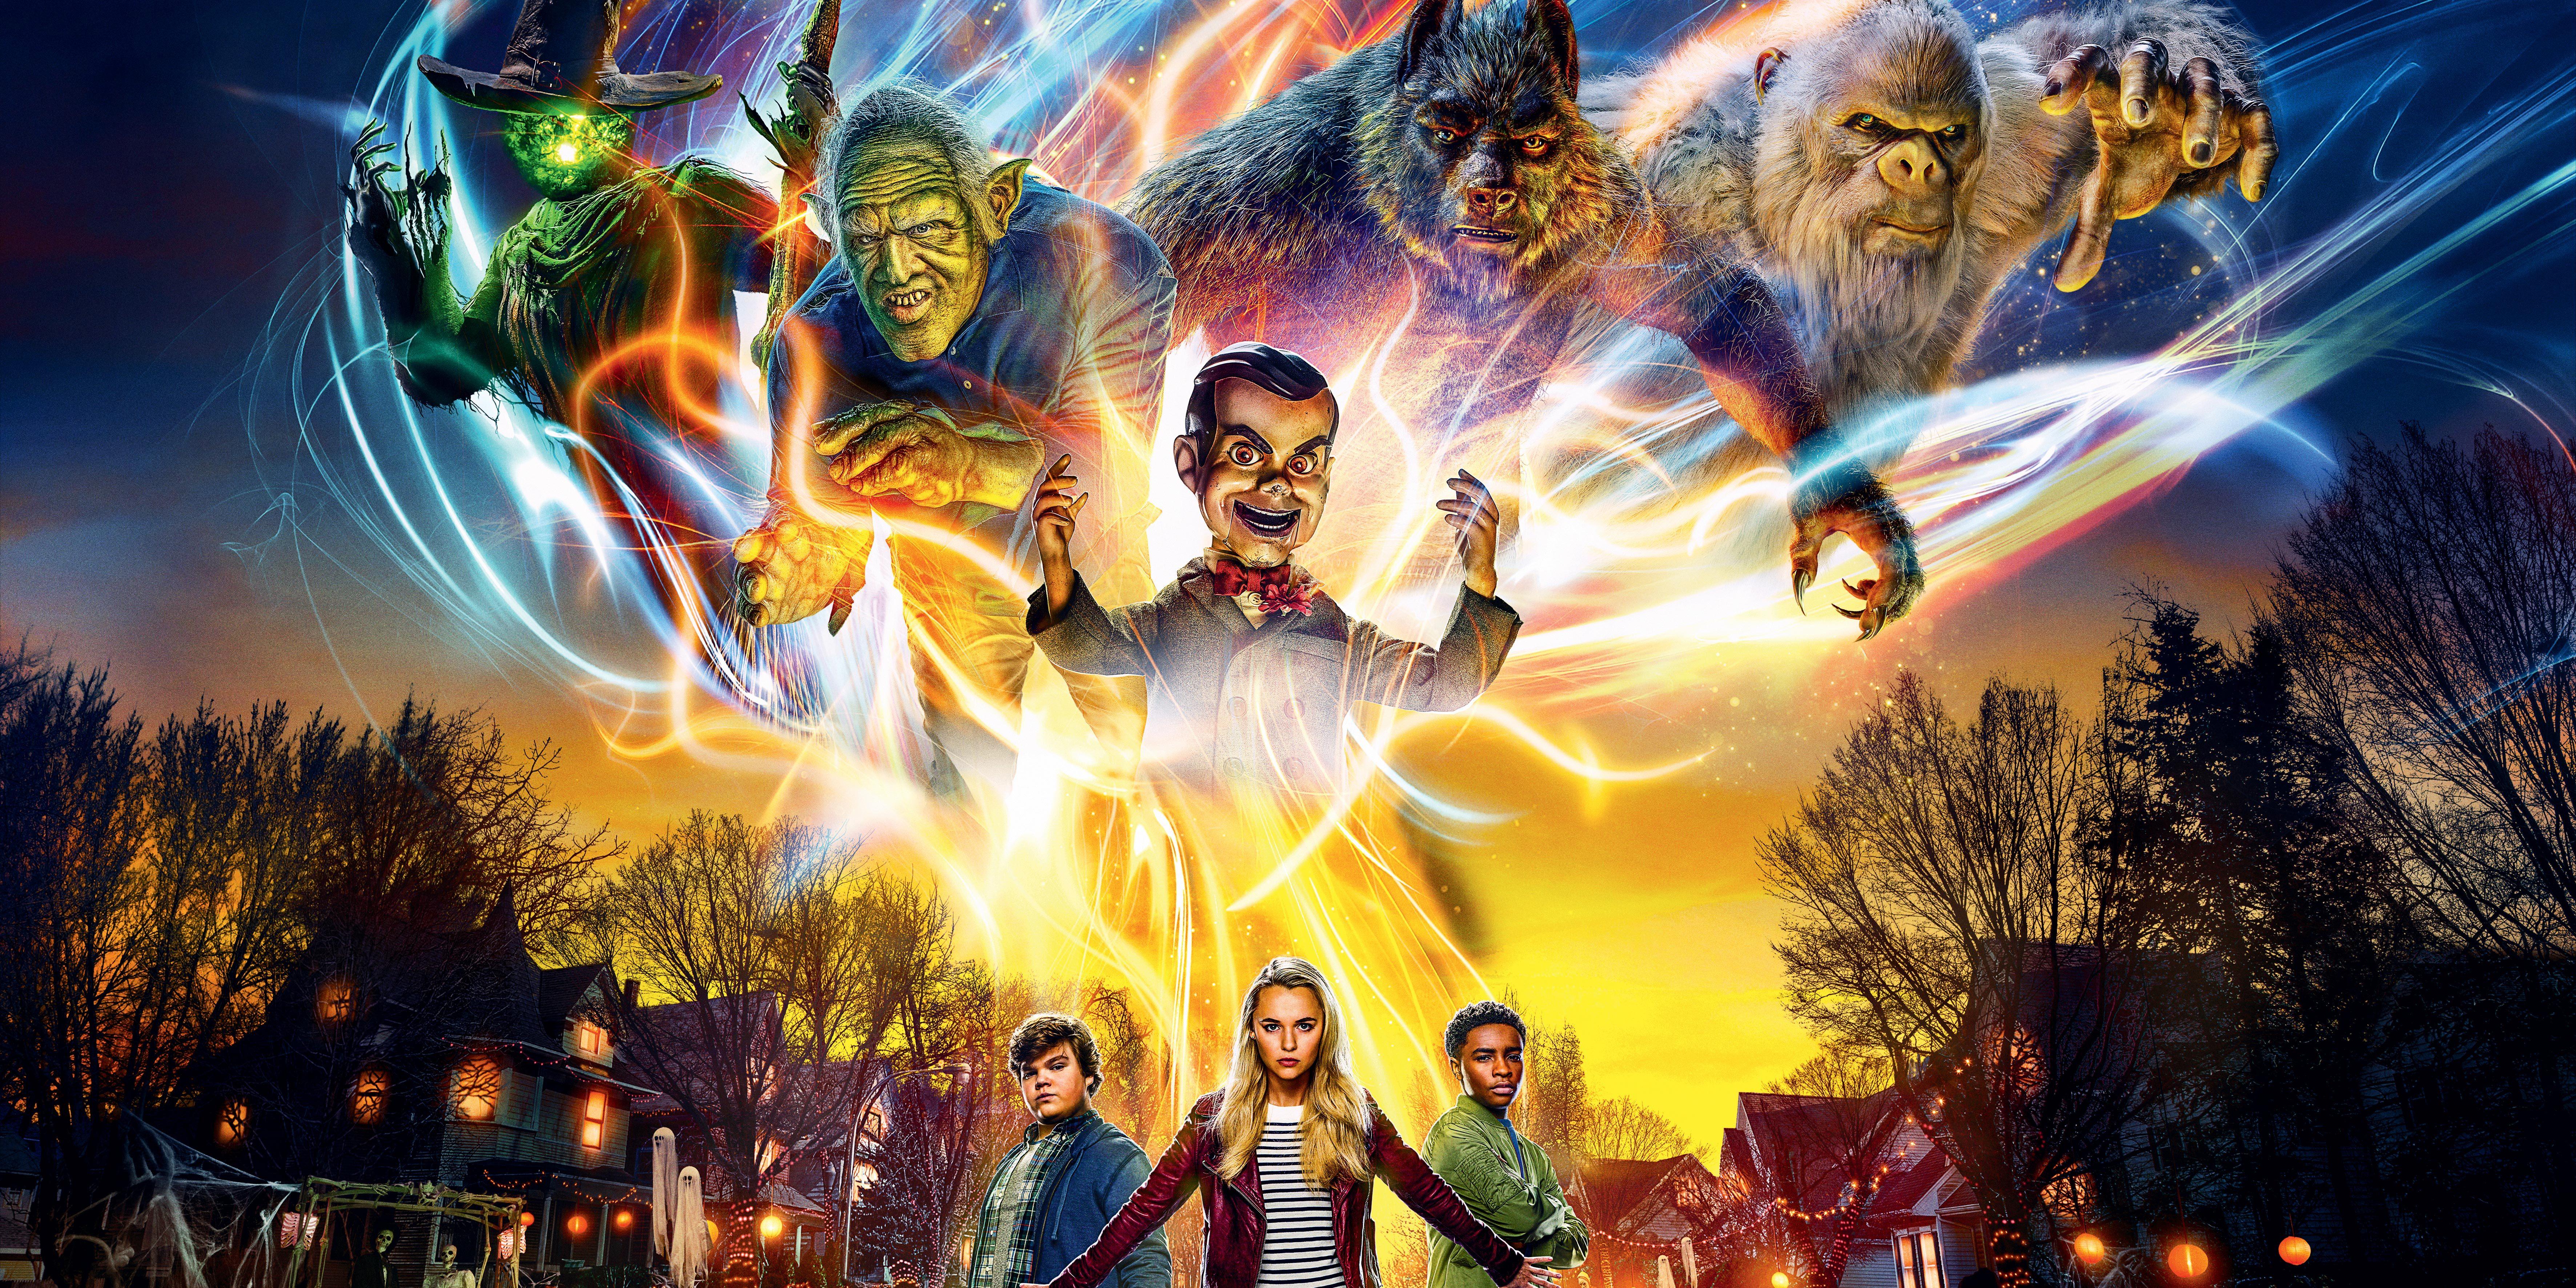 Free Download Goosebumps 2 Haunted Halloween 2018 Movie